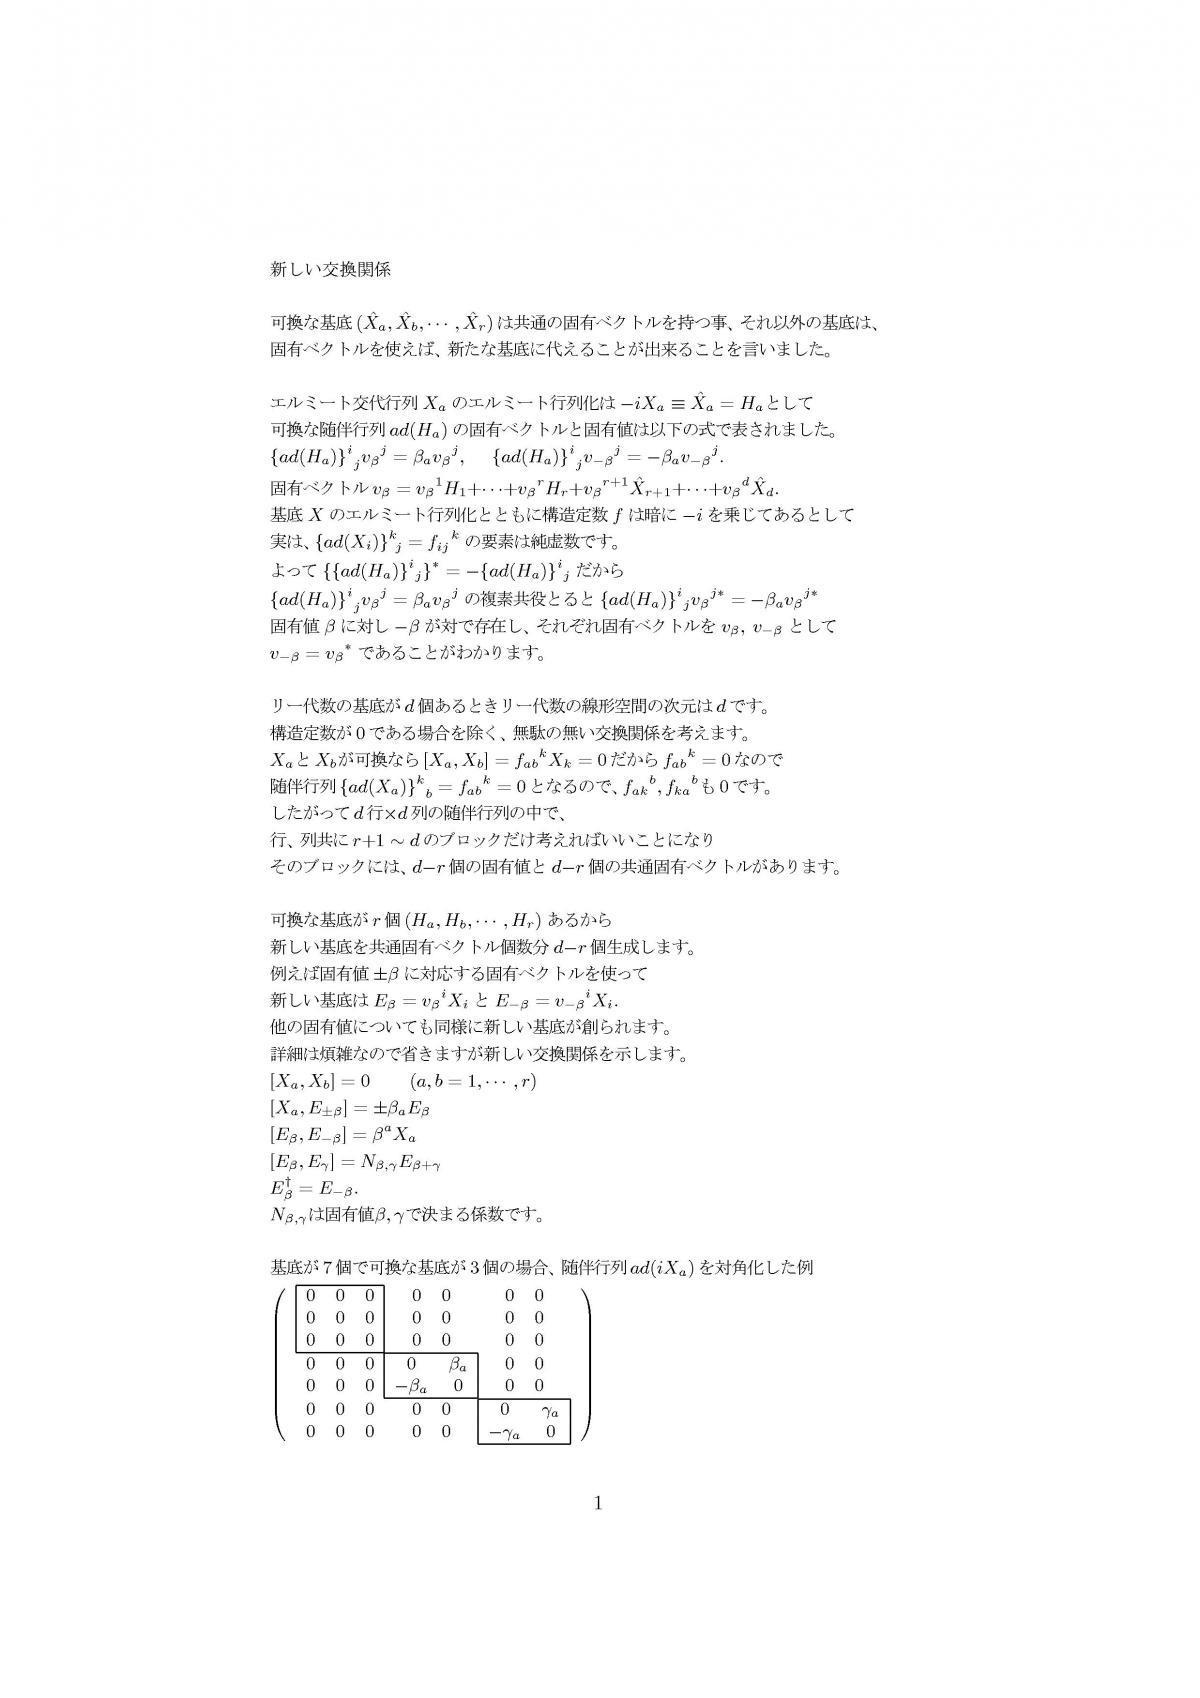 grp130804.jpg